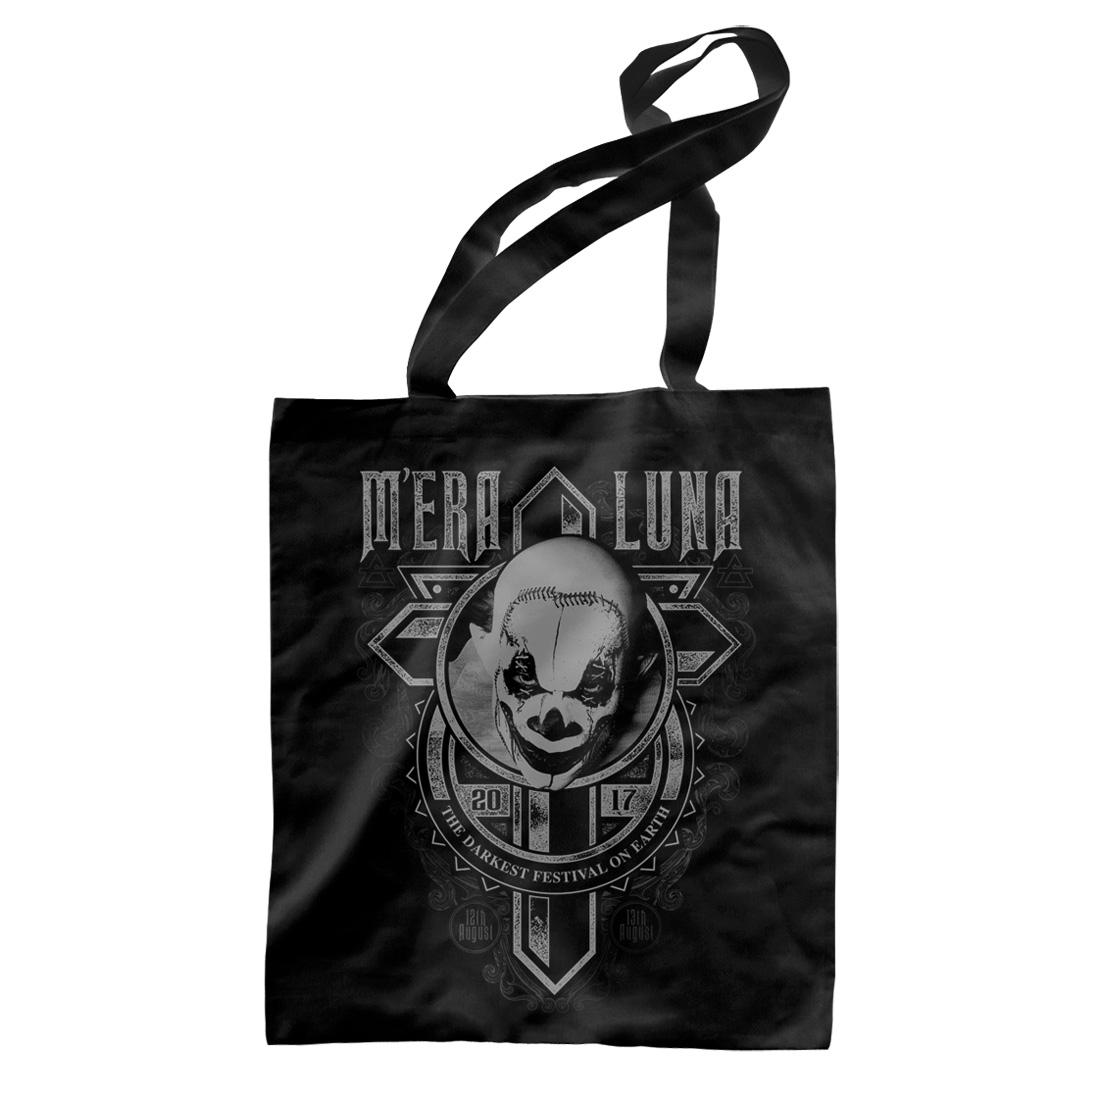 Clown Cross von Mera Luna Festival - Record Bag jetzt im My Festival Shop Shop